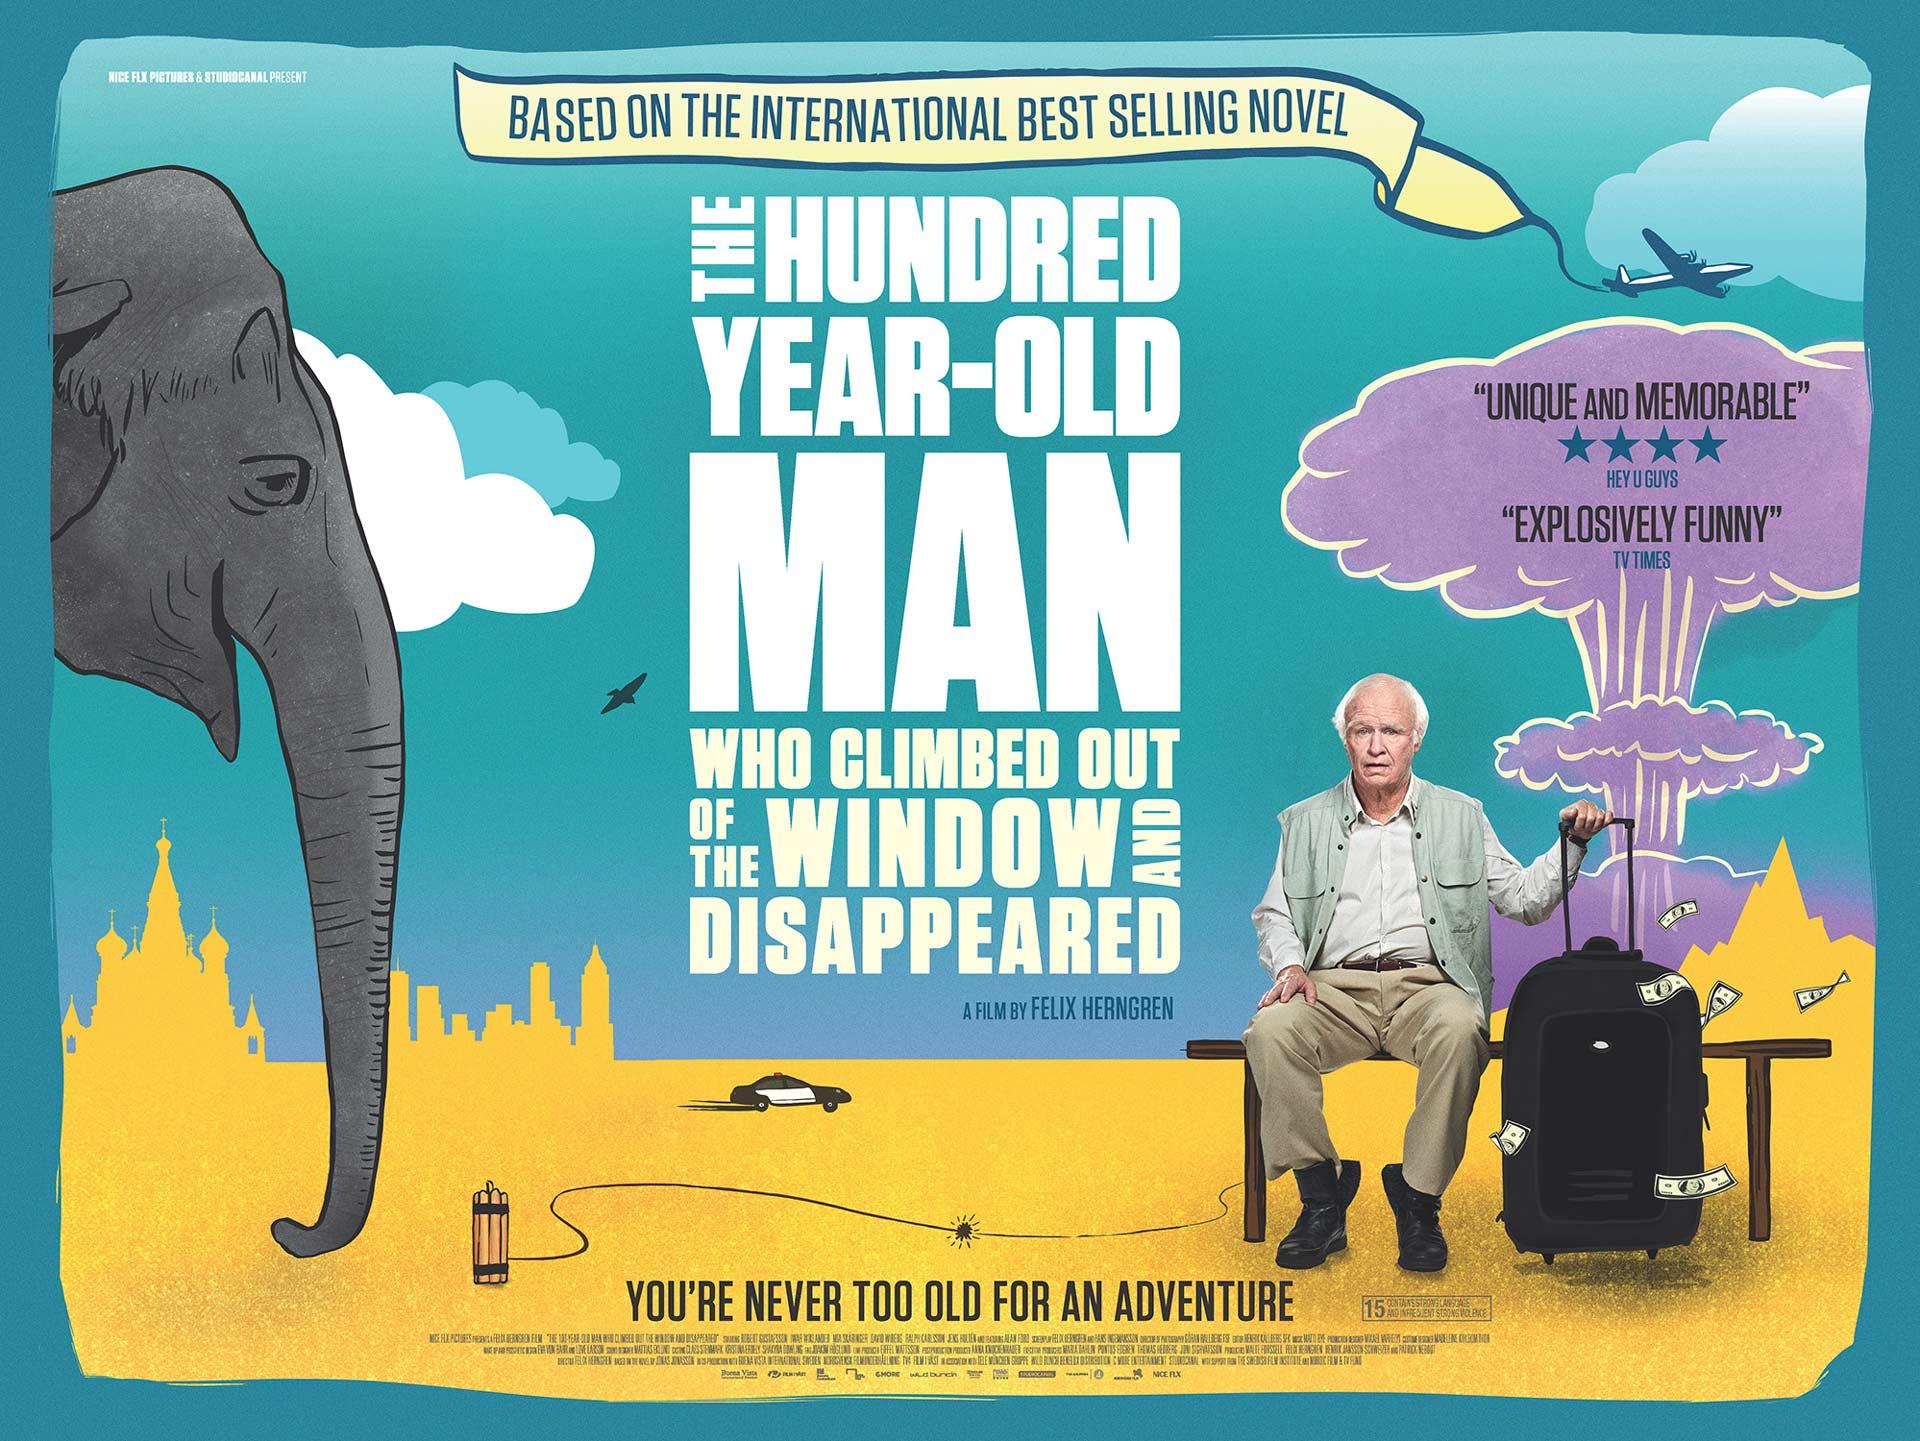 Simon Webb - The One Hundred Year Man